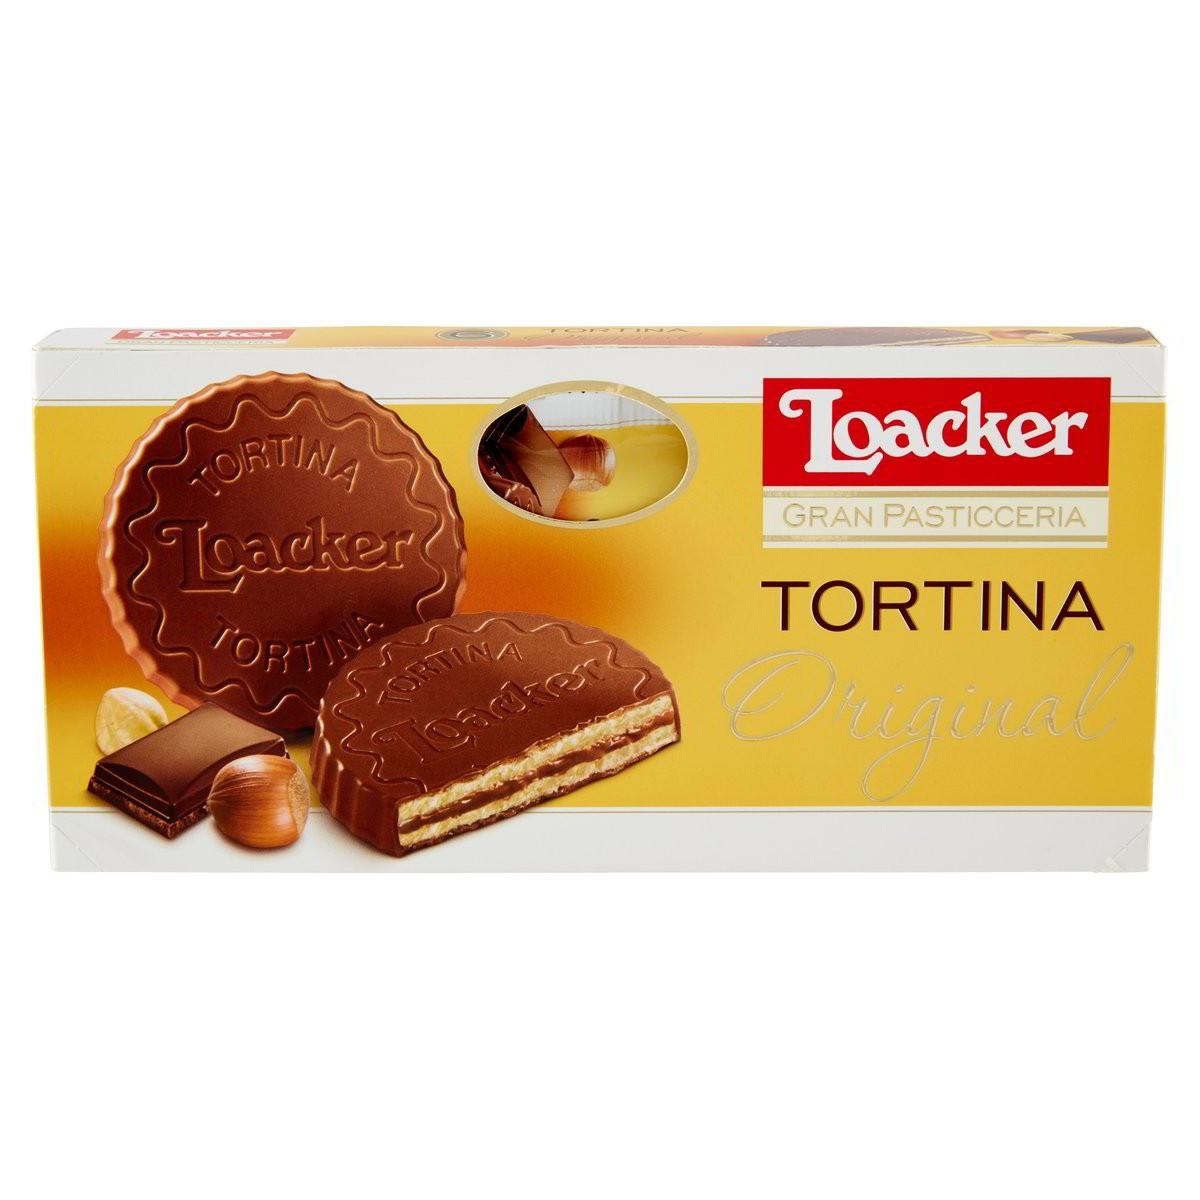 Loacker Tortina